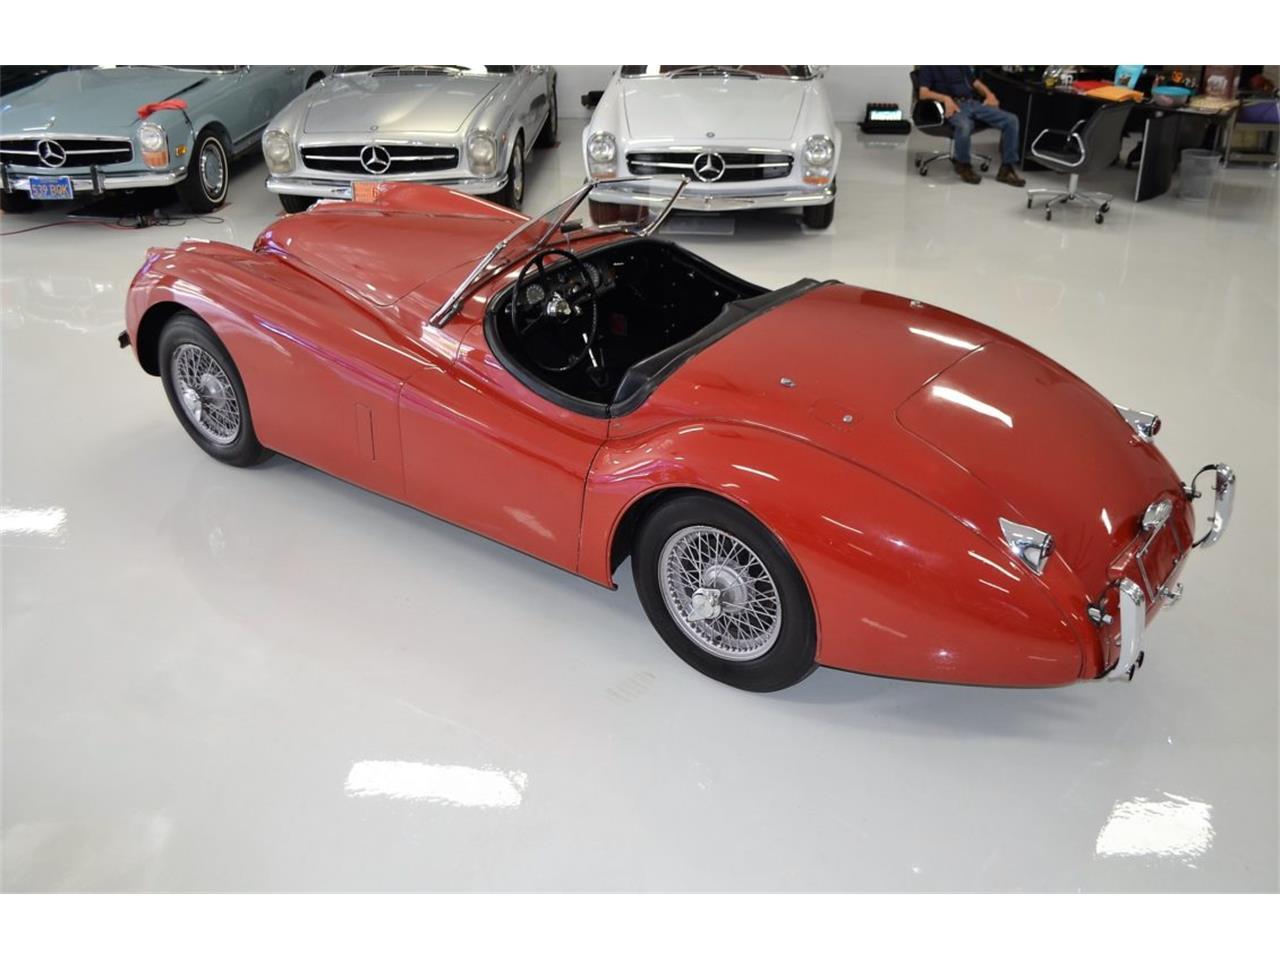 Large Picture of '52 XK120 located in Arizona - $69,800.00 - PXTA